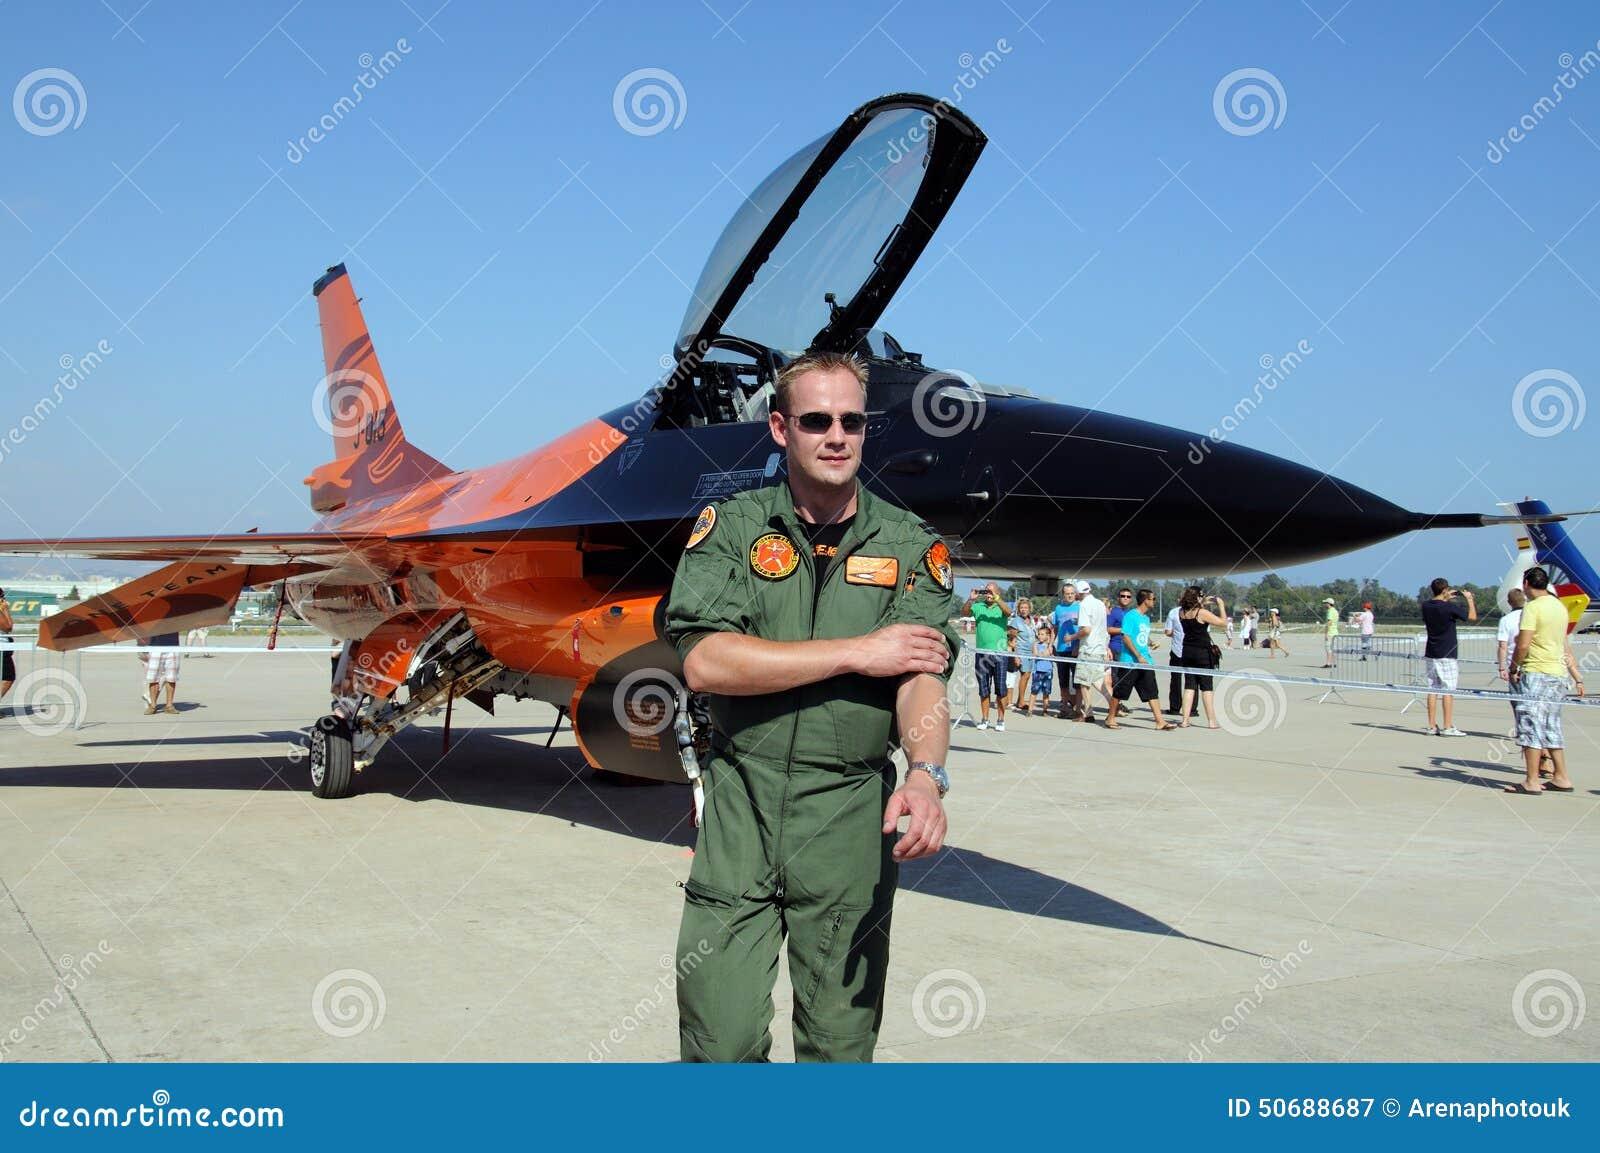 Download 飞行员和F-16猎鹰 图库摄影片. 图片 包括有 强制, 西班牙语, 航空学, 运输, 显示, 战斗机, 通用 - 50688687